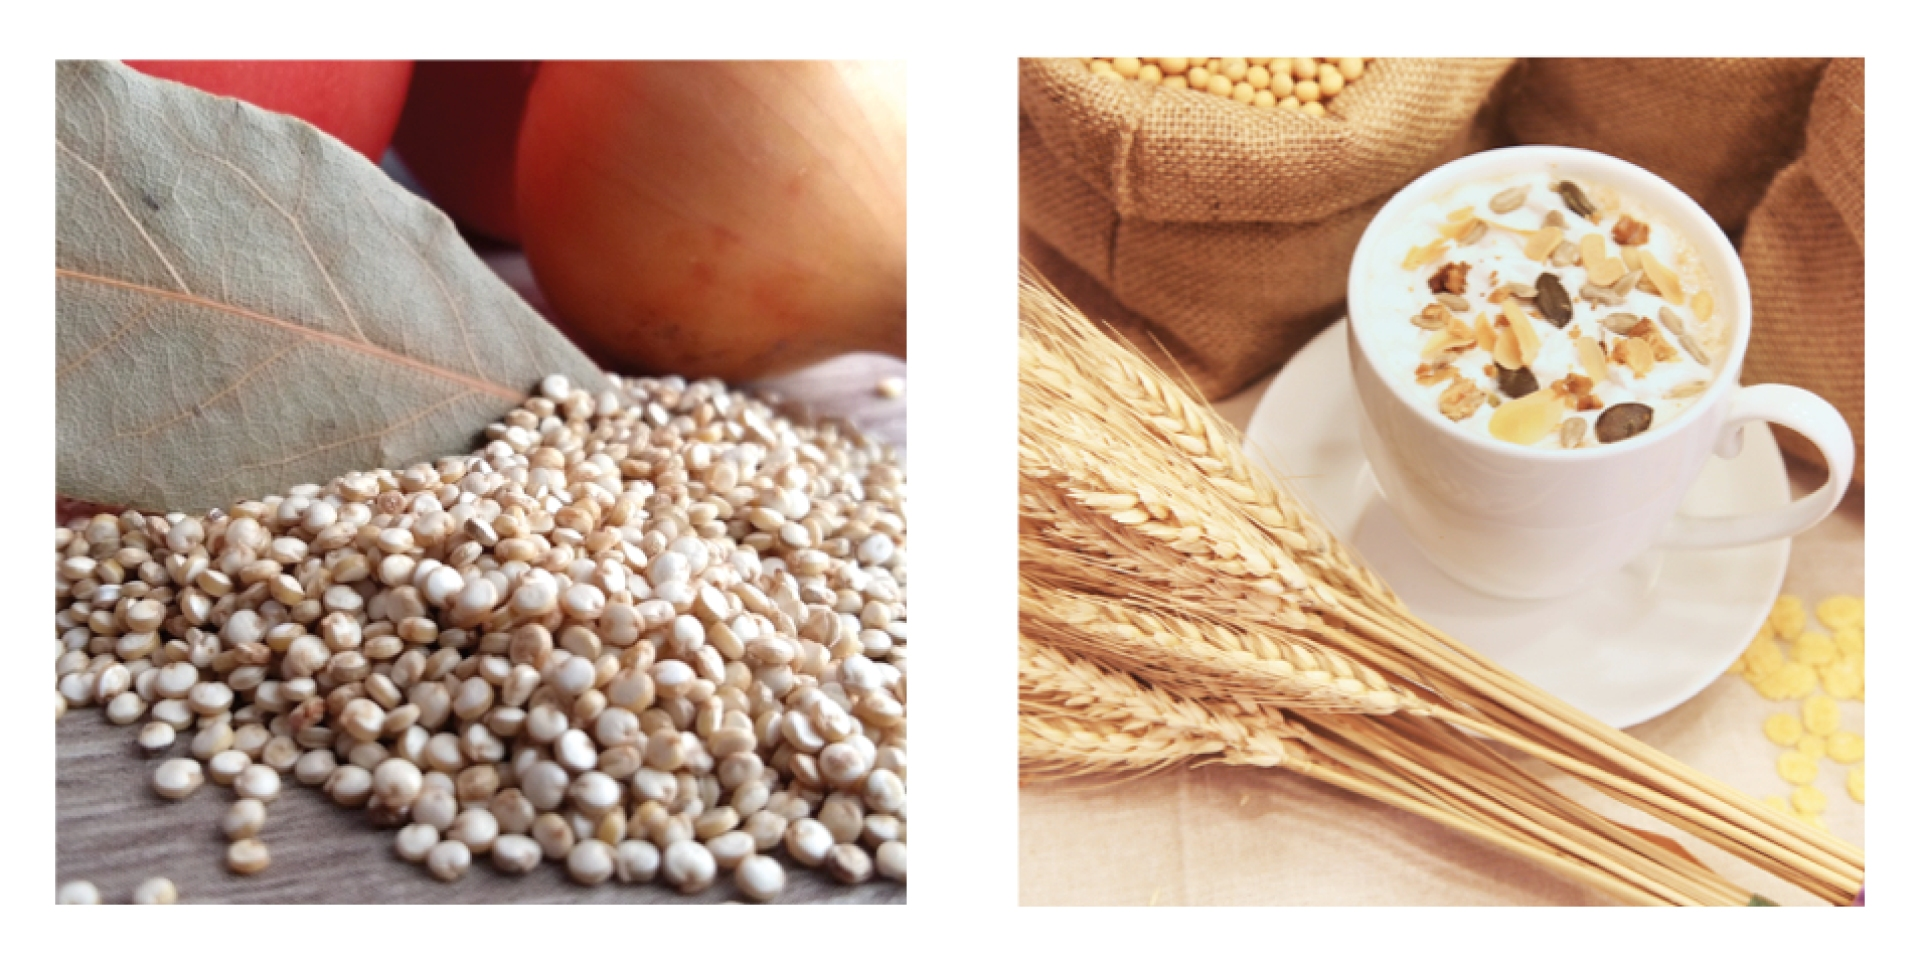 Quinoa vs. Hafer Superfood